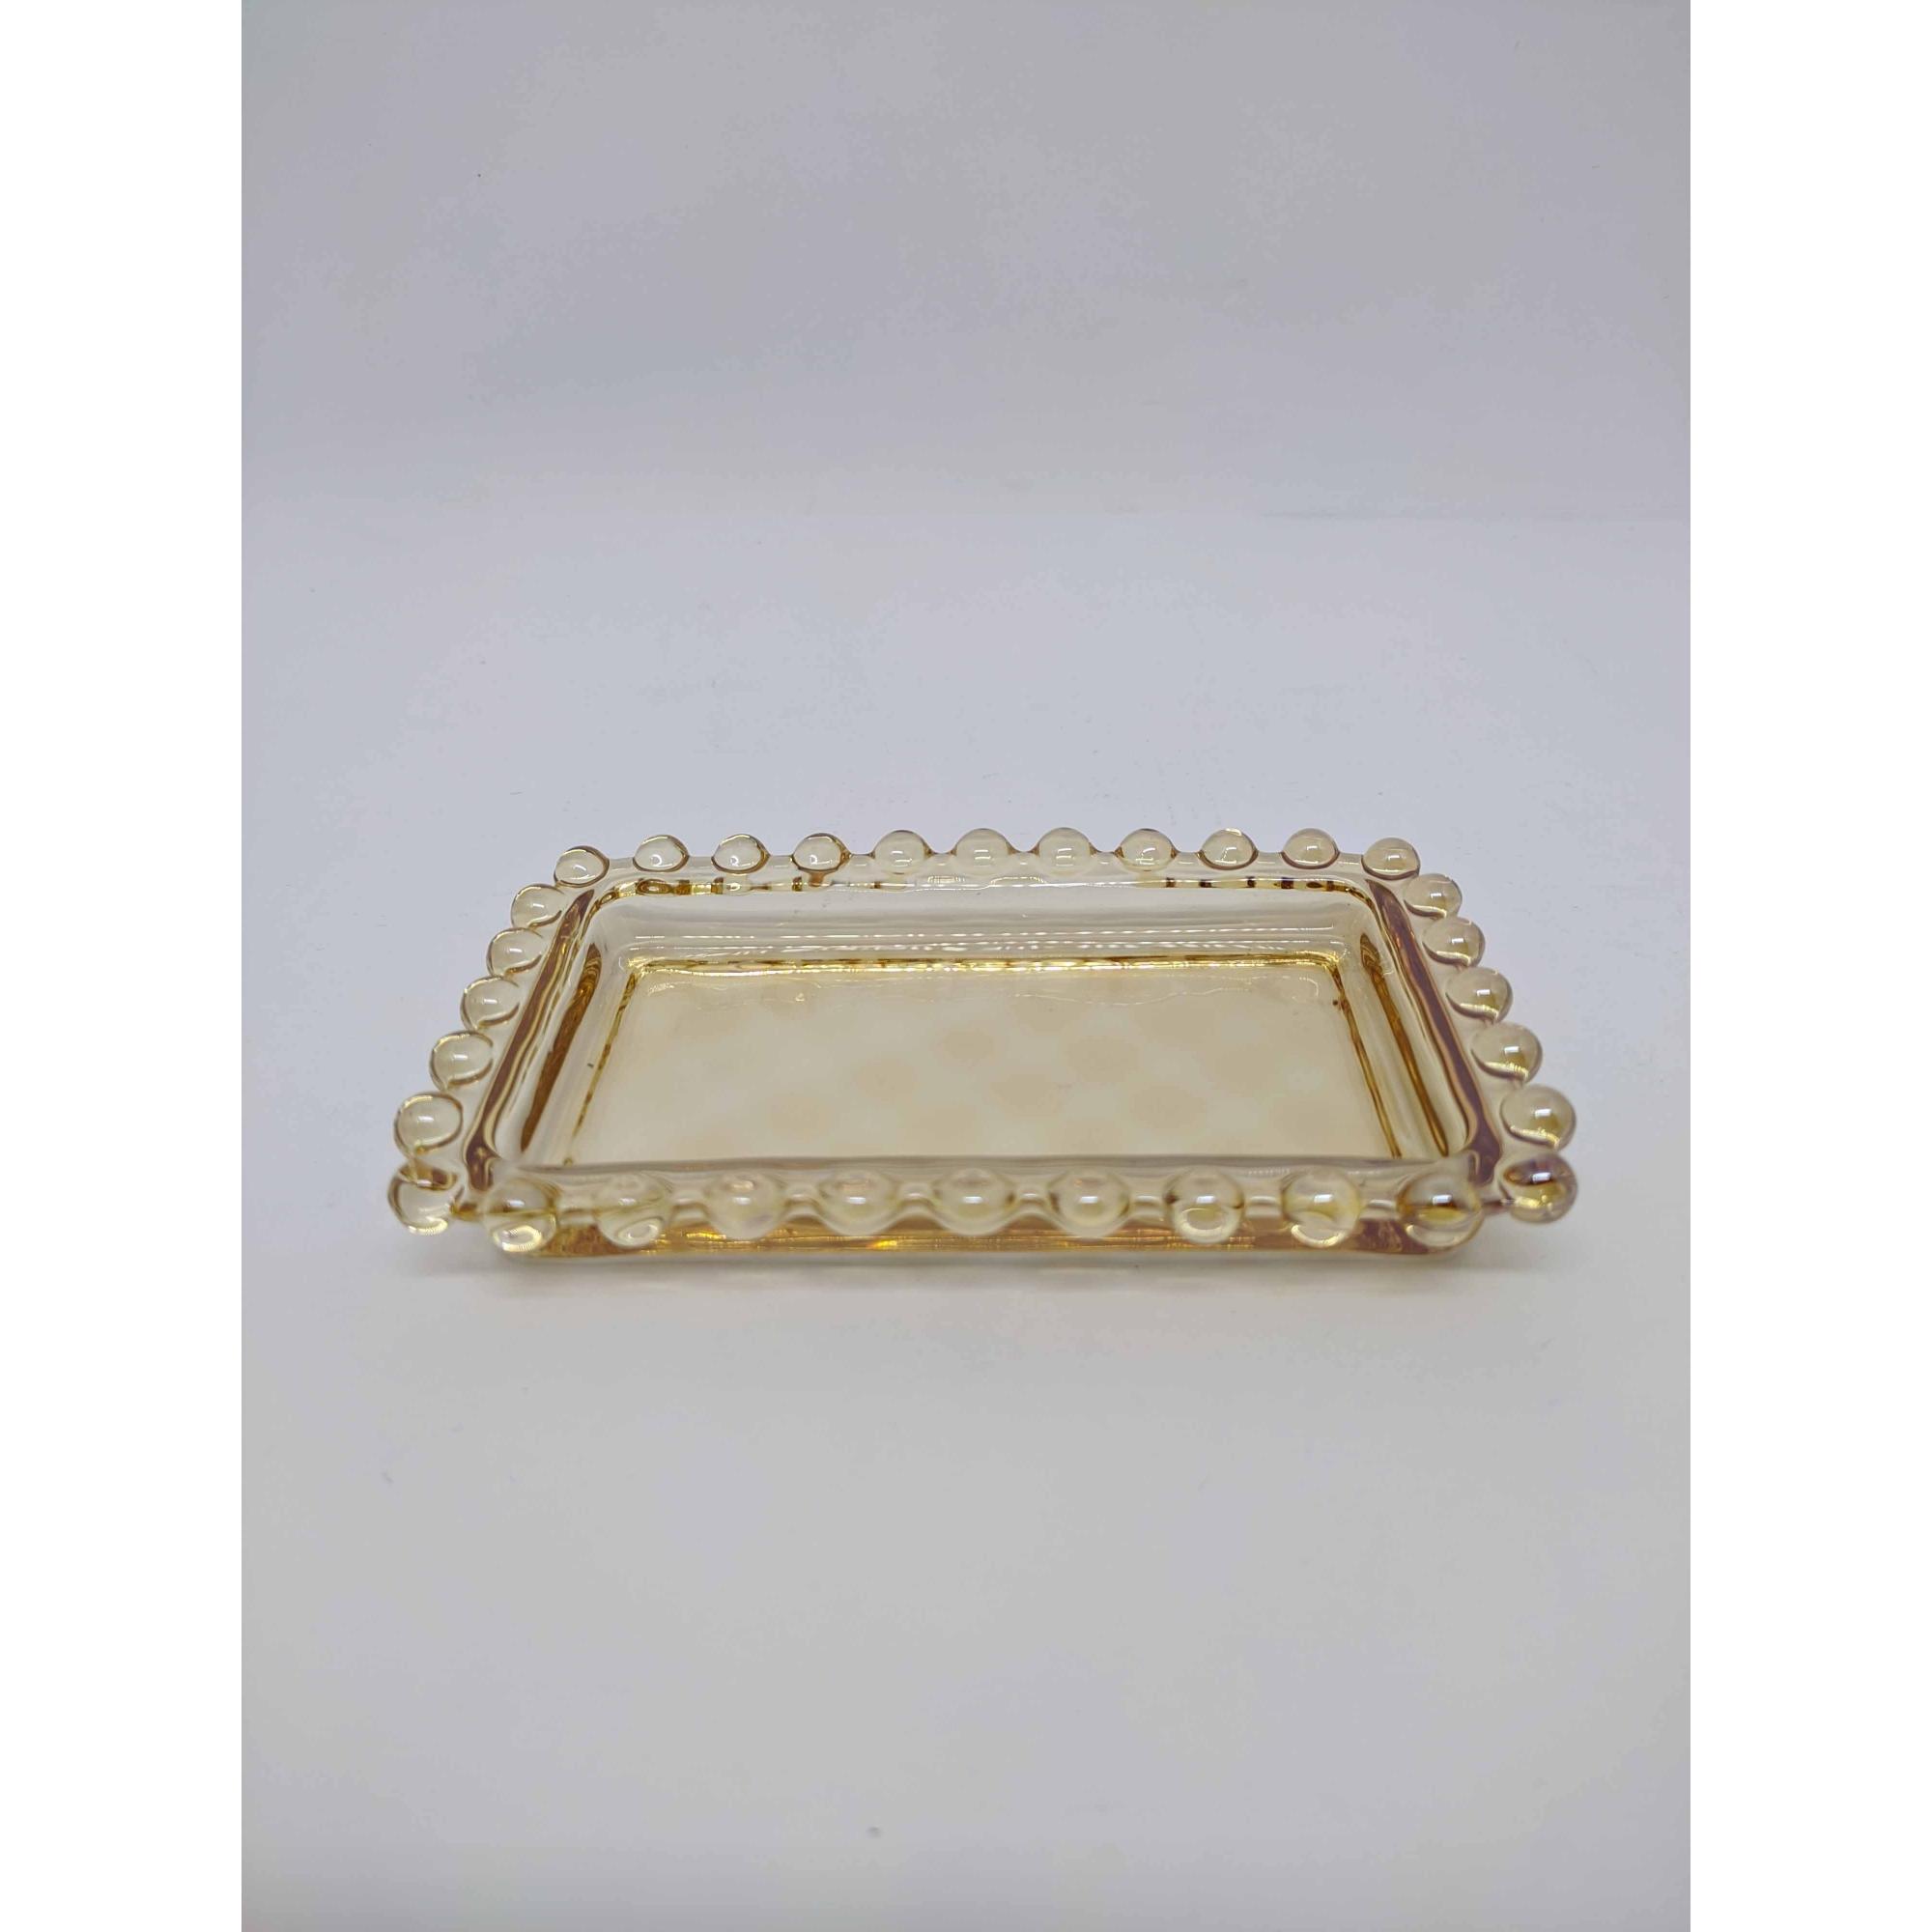 Manteigueira Cristal de Chumbo Pearl Ambar 14x9x10